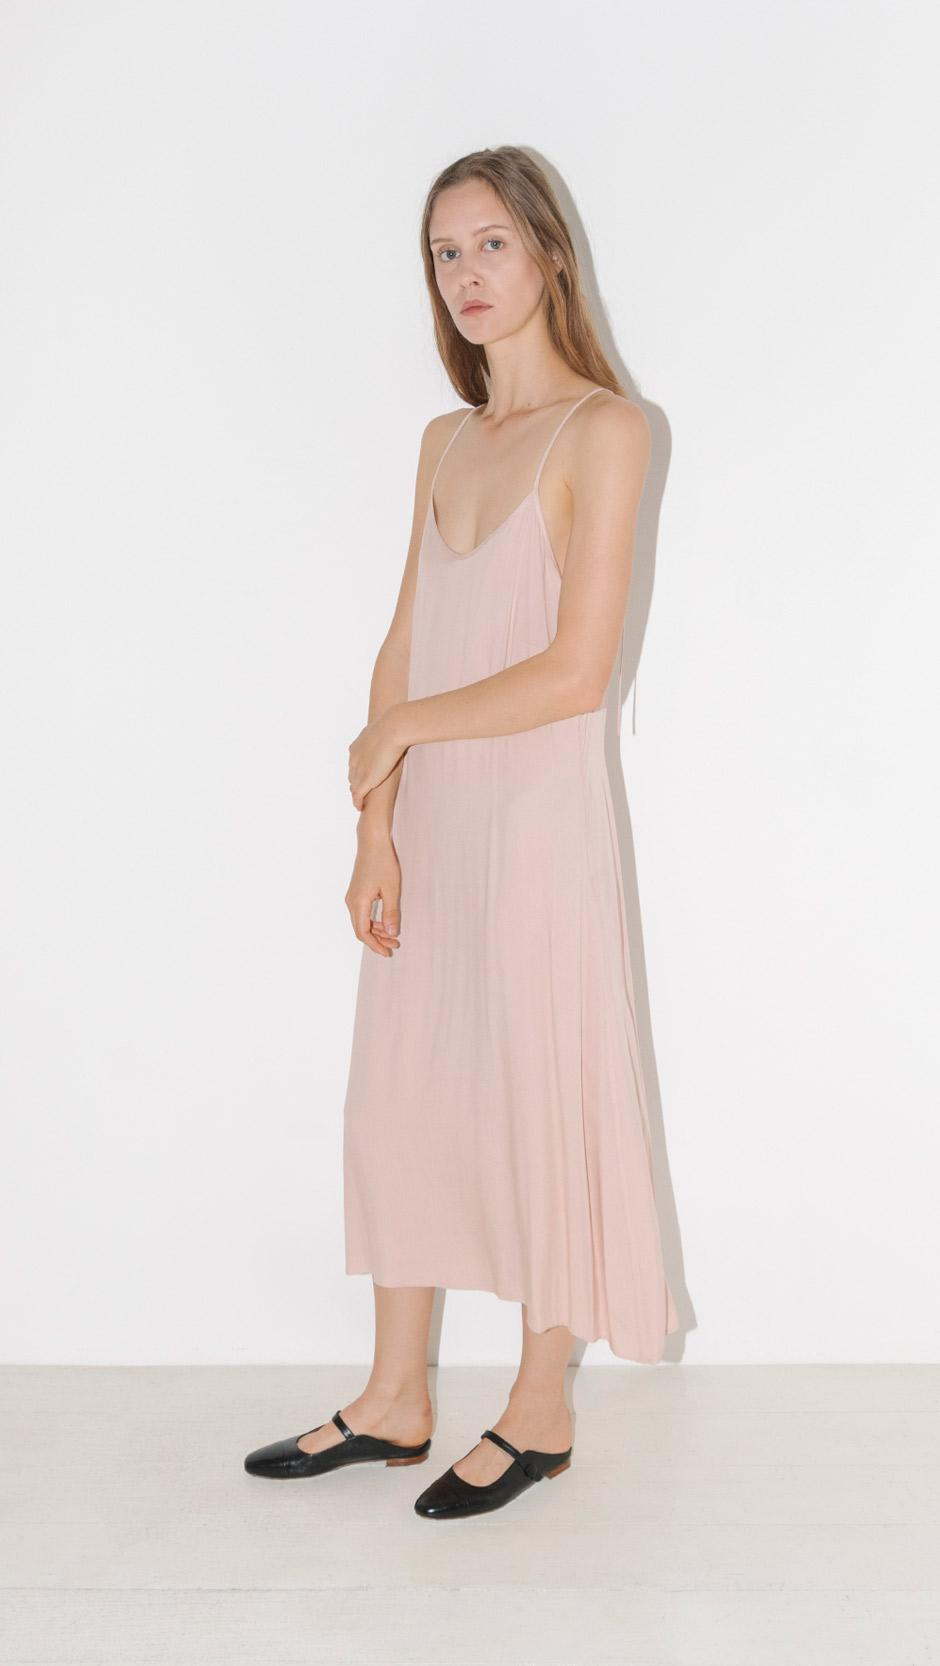 d27ae44a3876 Lyst - Jesse Kamm The Slip Dress in Pink